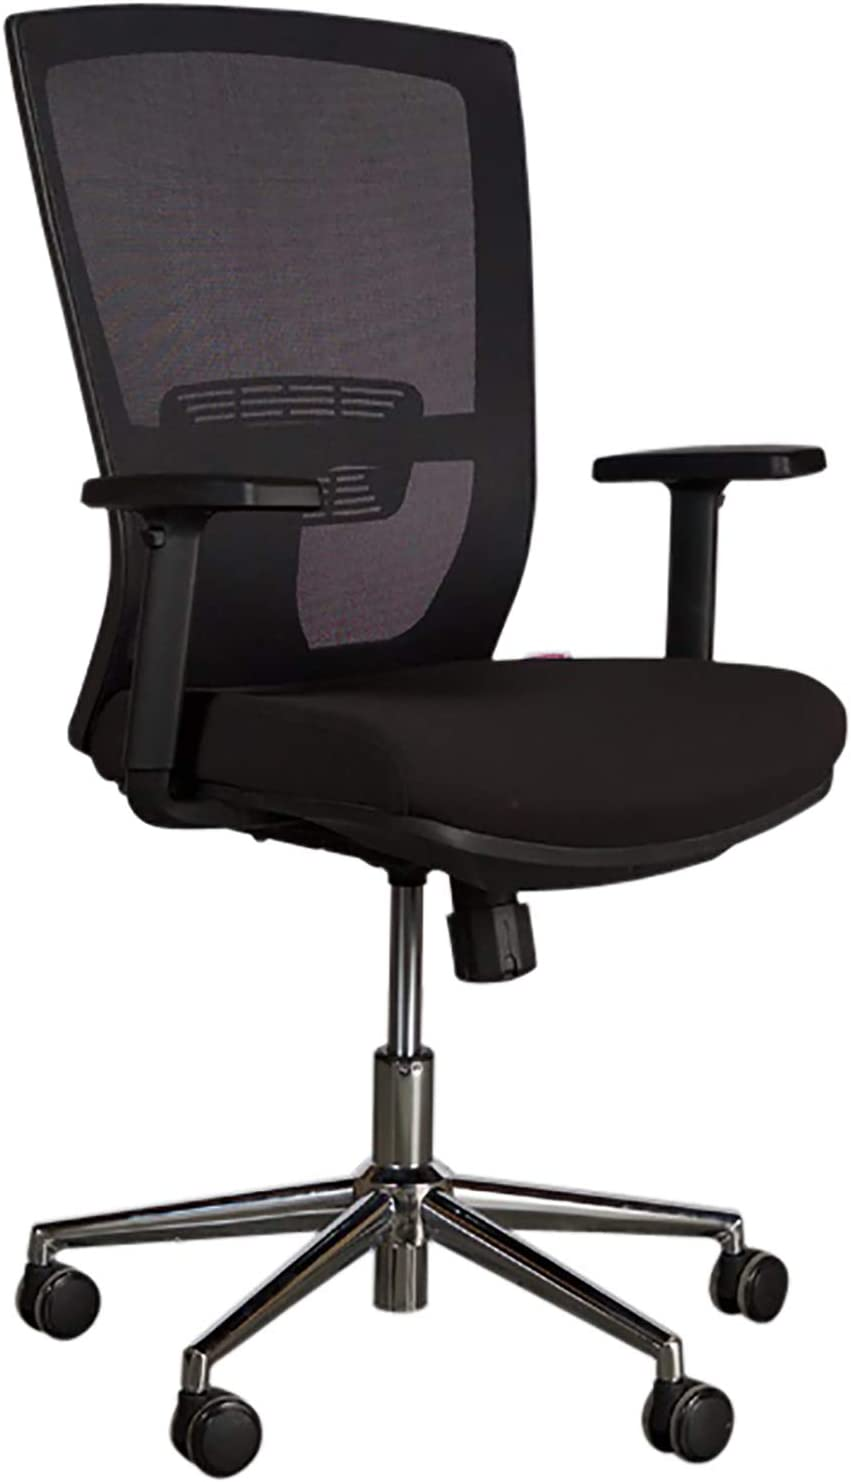 Mahmayi sleekline t01b medium back ergonomic chair – quality mesh fabric upholstery, molded foam cushioning – office chair with chrome base – adjustable armchair – black - 48 x 48 x 108cm